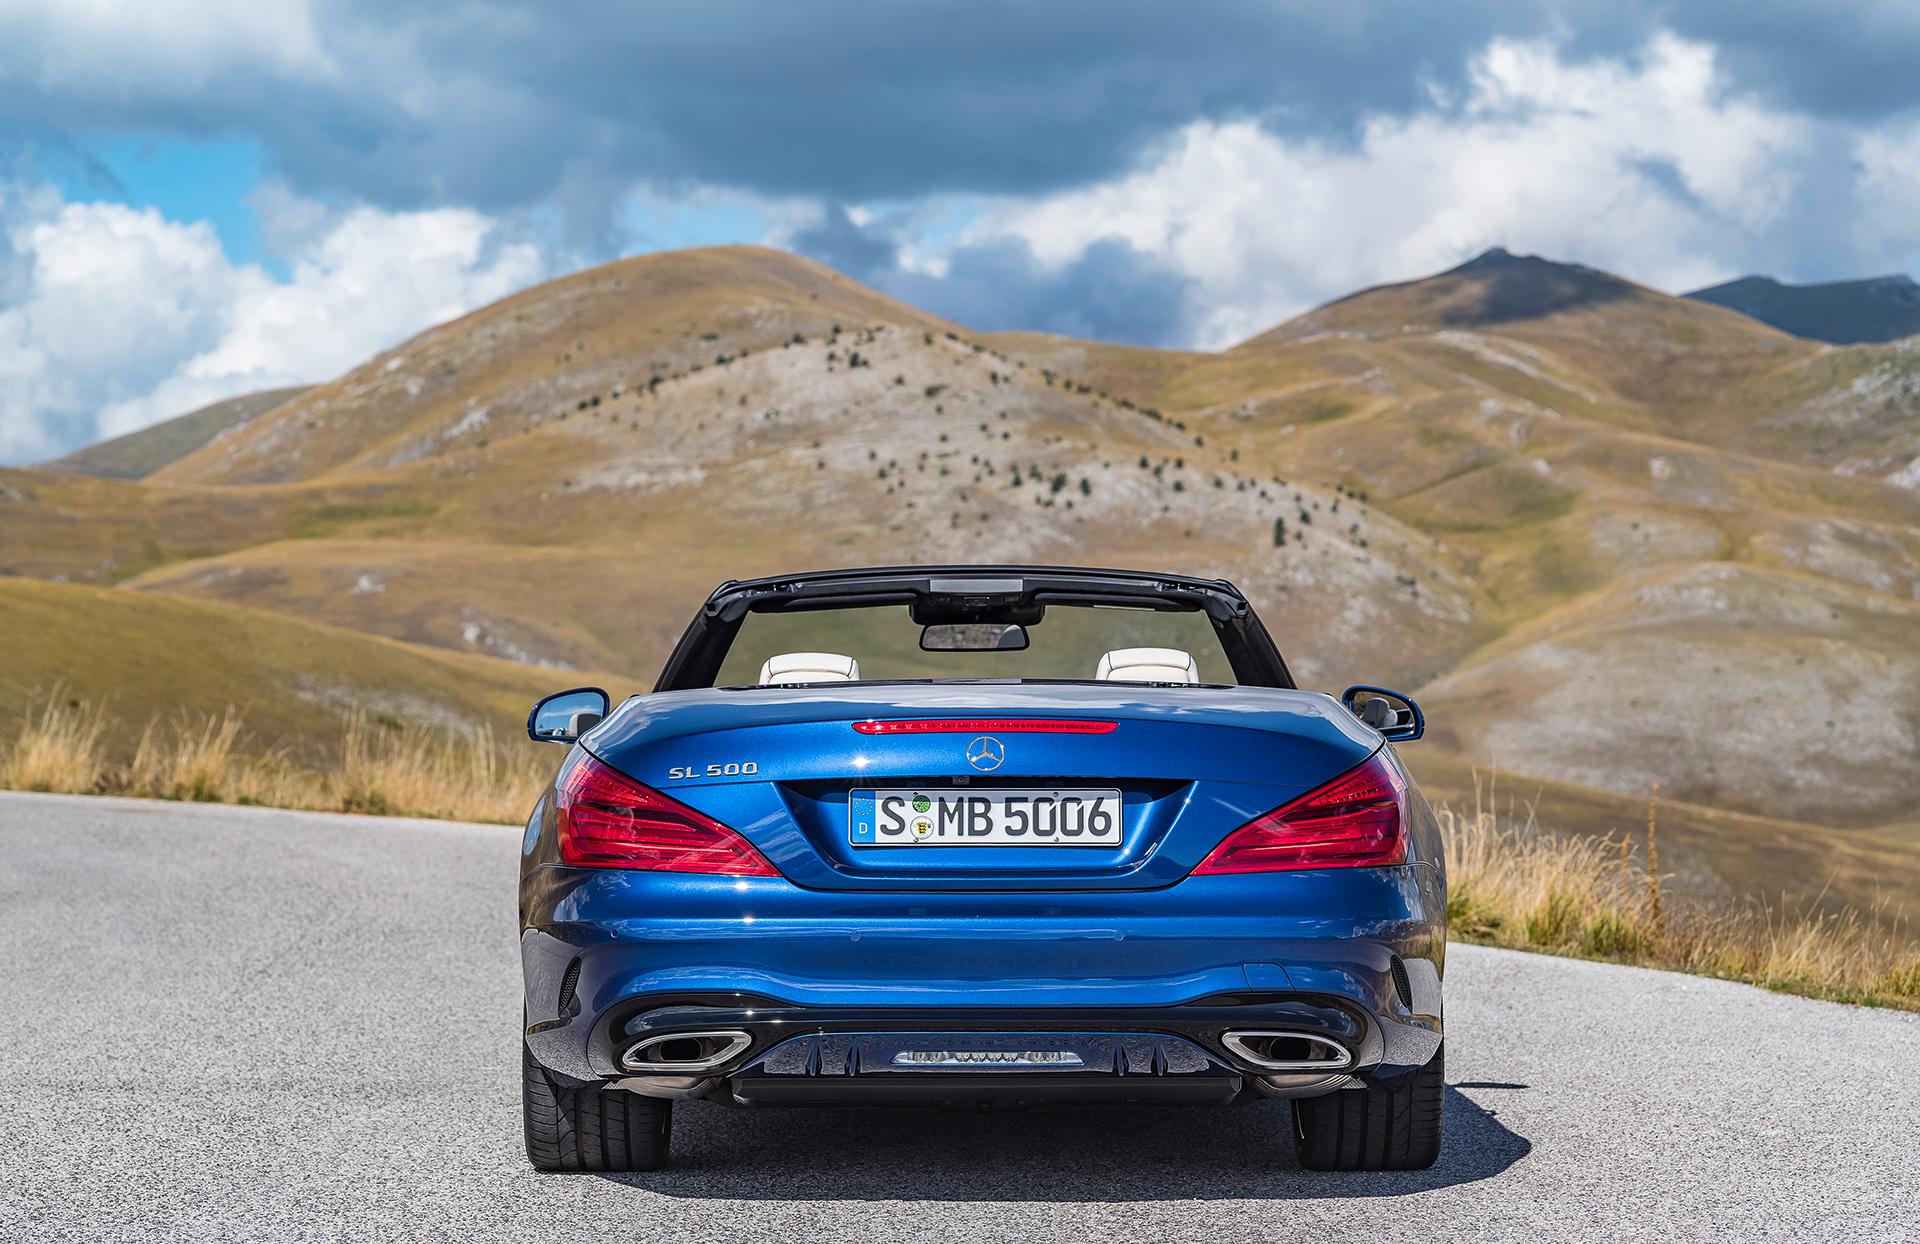 Mercedes-Benz SL - 2016 - arrière / rear